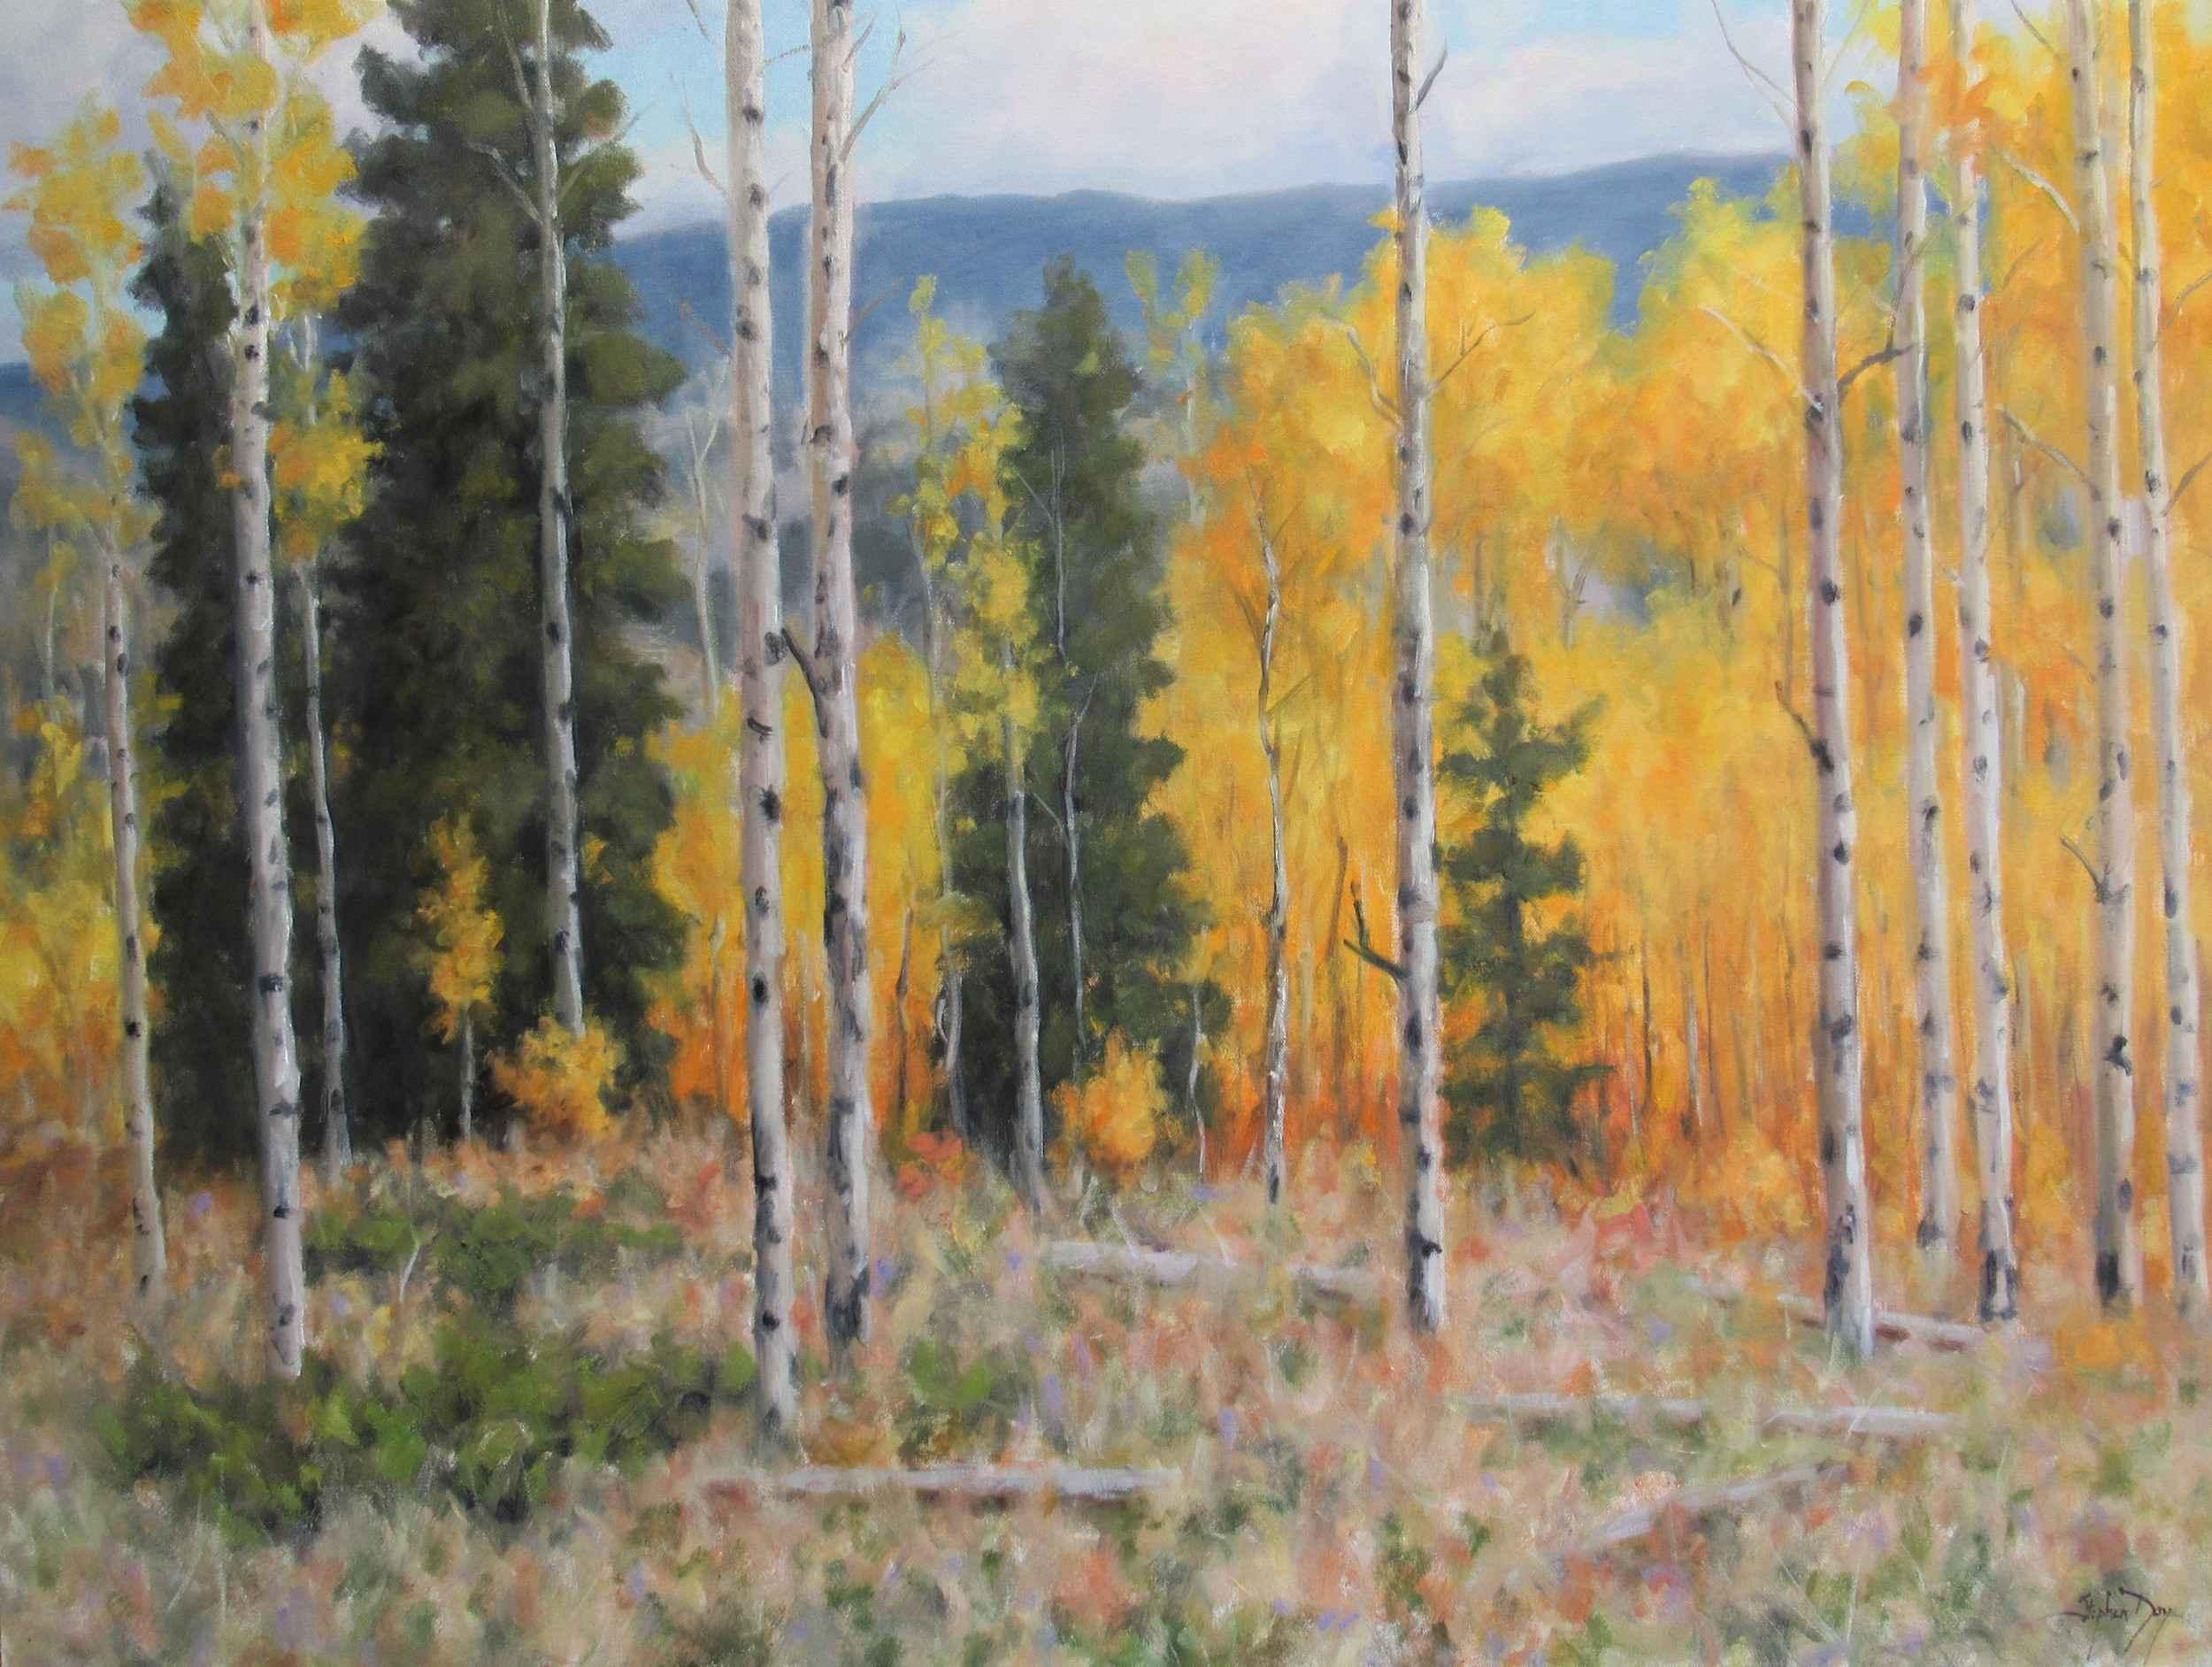 Fall Splendor by  Stephen Day - Masterpiece Online